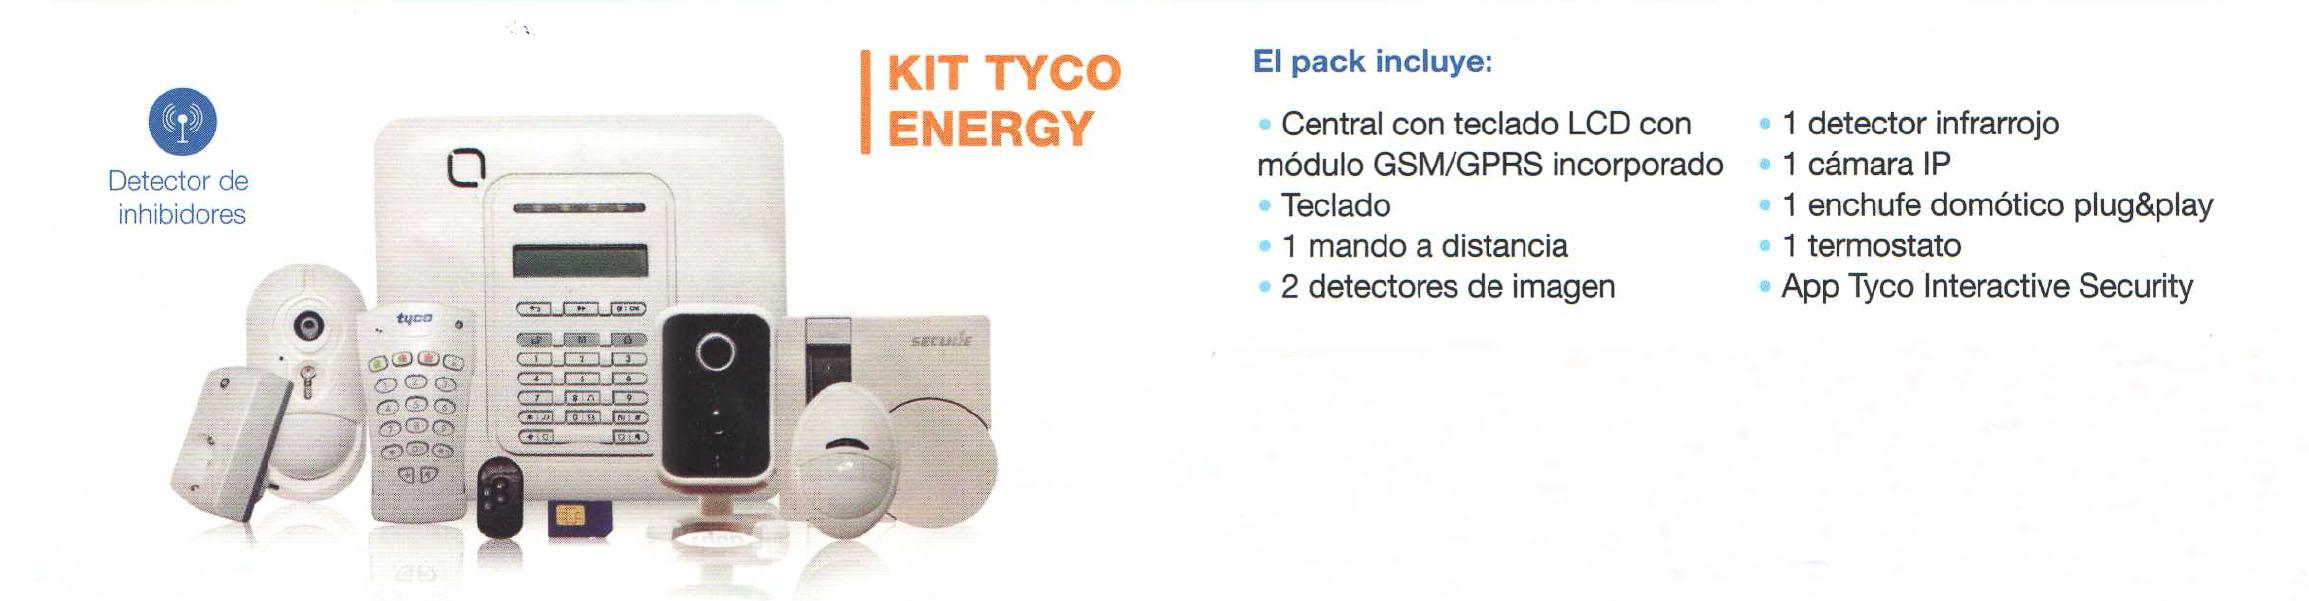 kit tyco energy